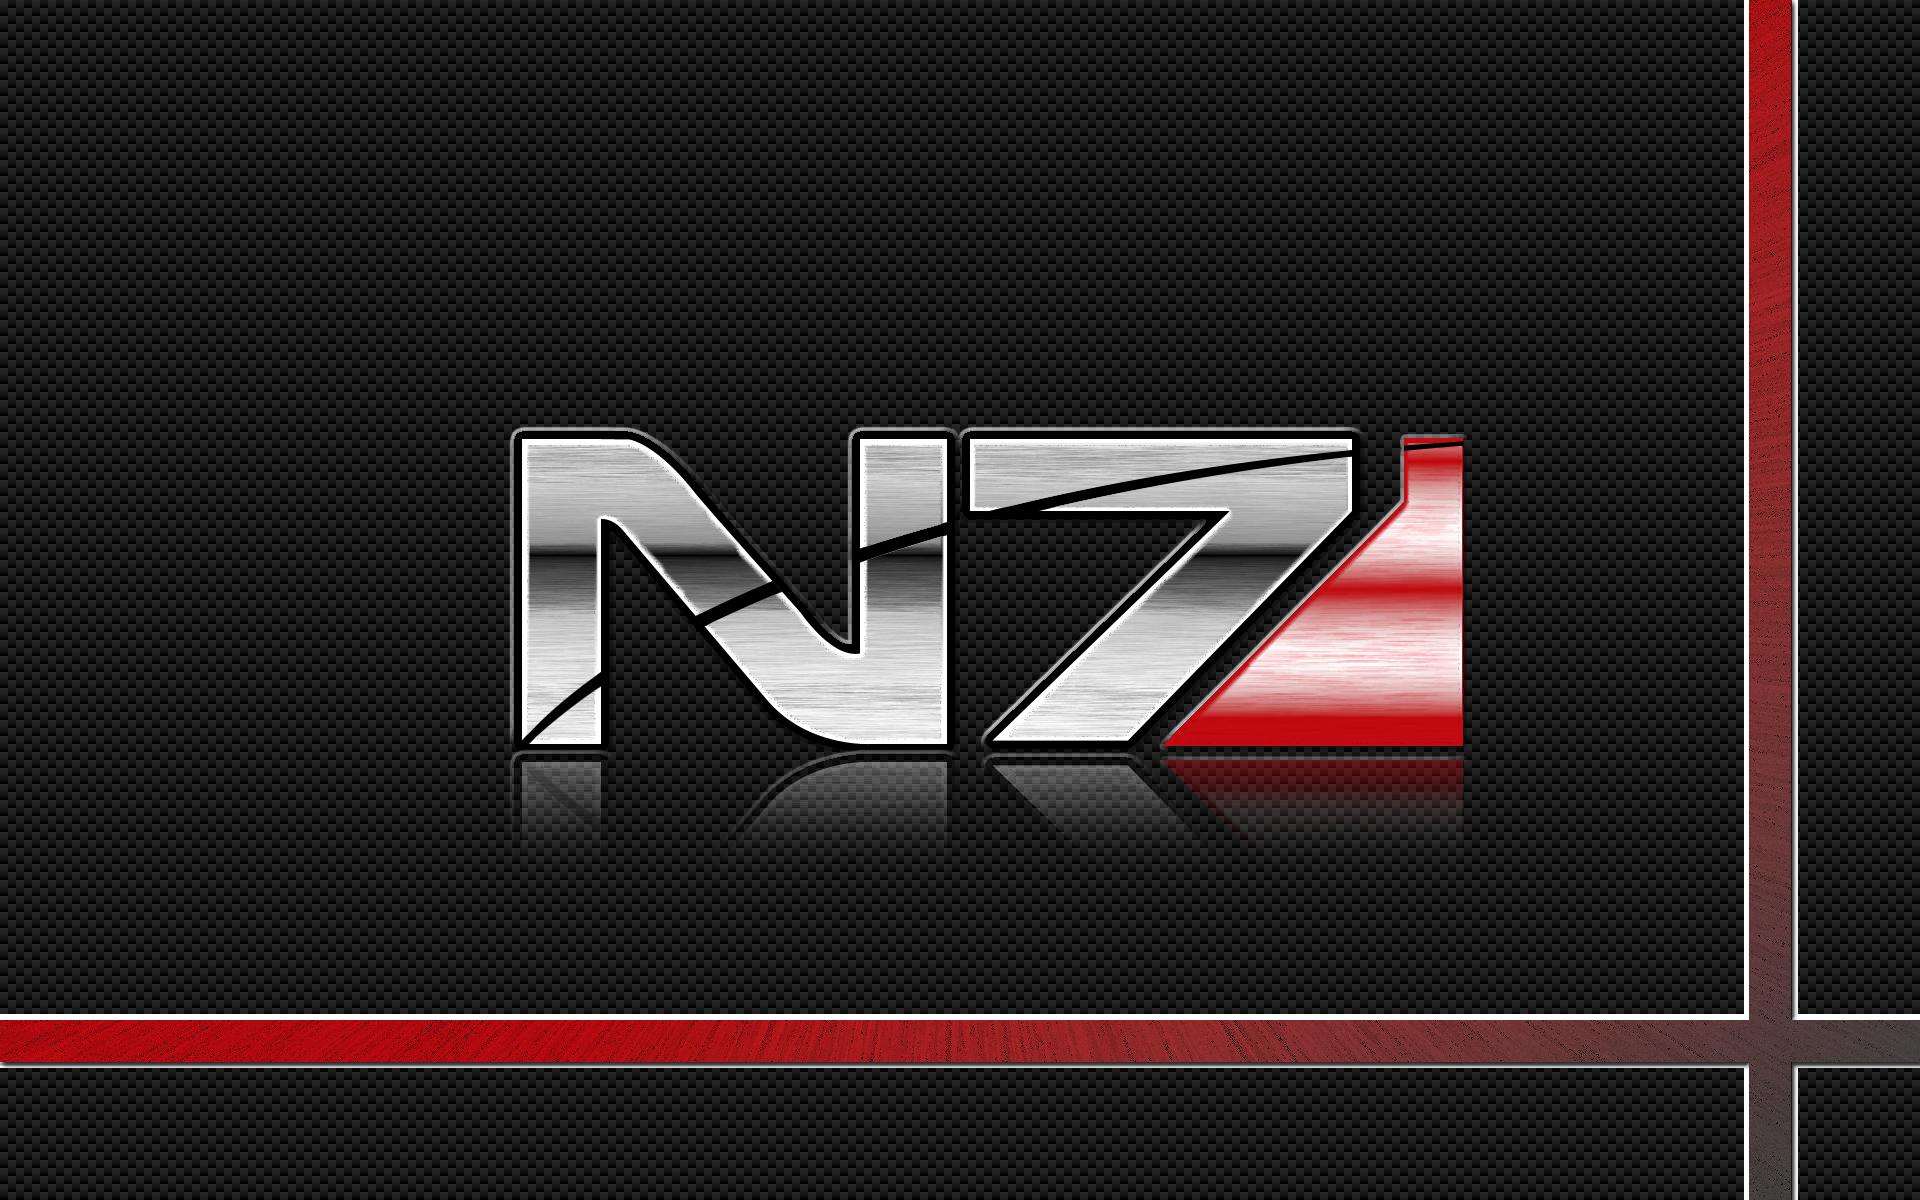 Mass Effect N7 Logo Wallpaper by pyrogx2000 on DeviantArt